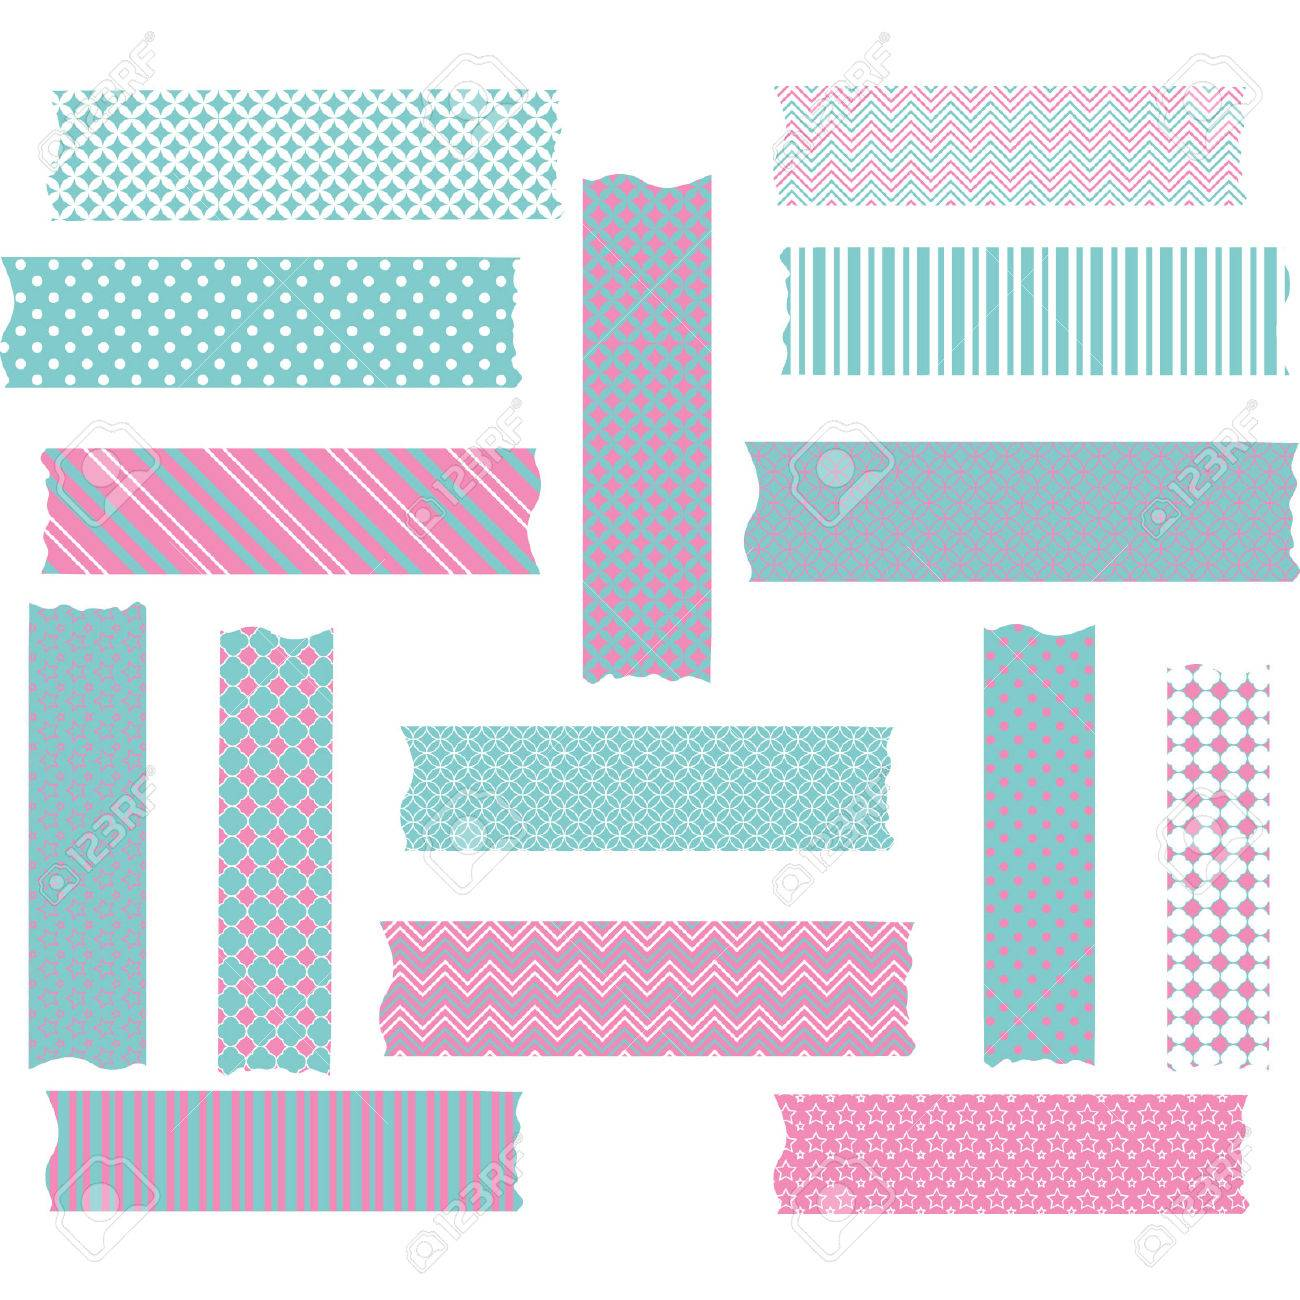 Pink And Aqua Washi Tape Graphics Set Royalty Free Cliparts Vectors